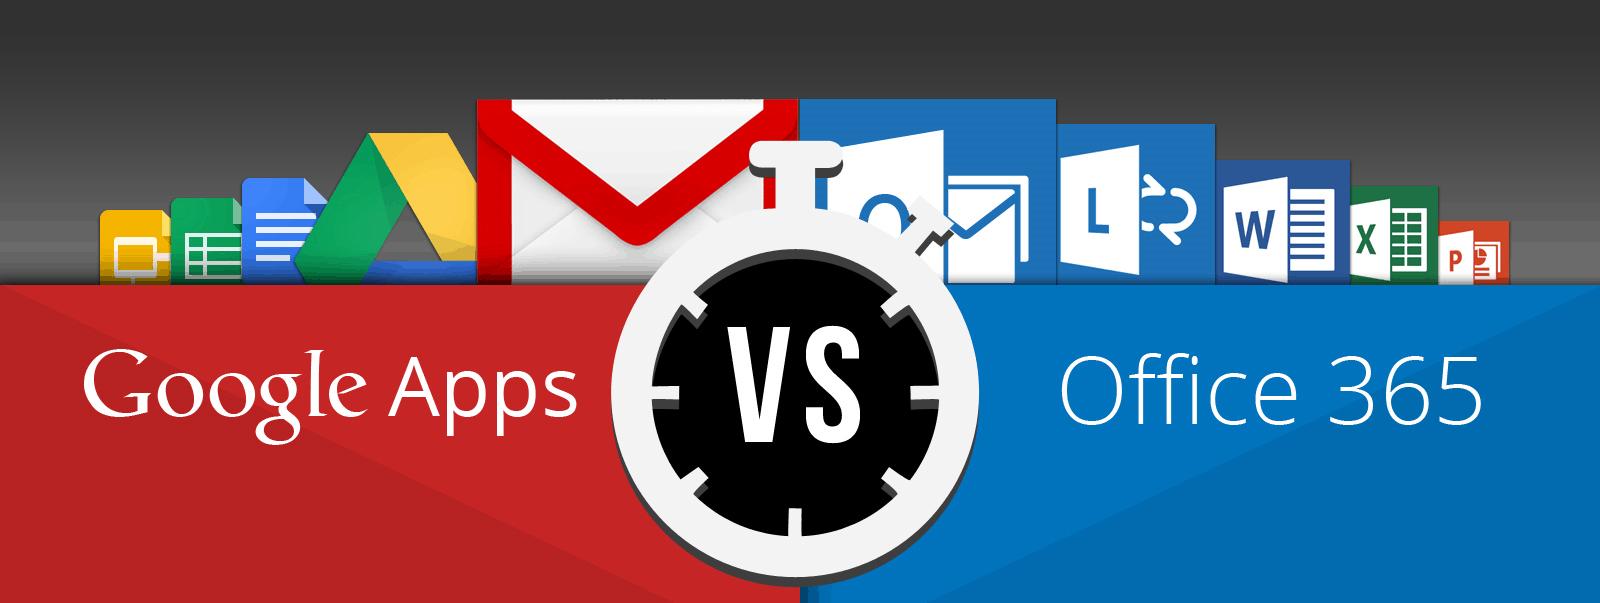 Google Apps vs Office 365   Web Design by Danielle Shaw